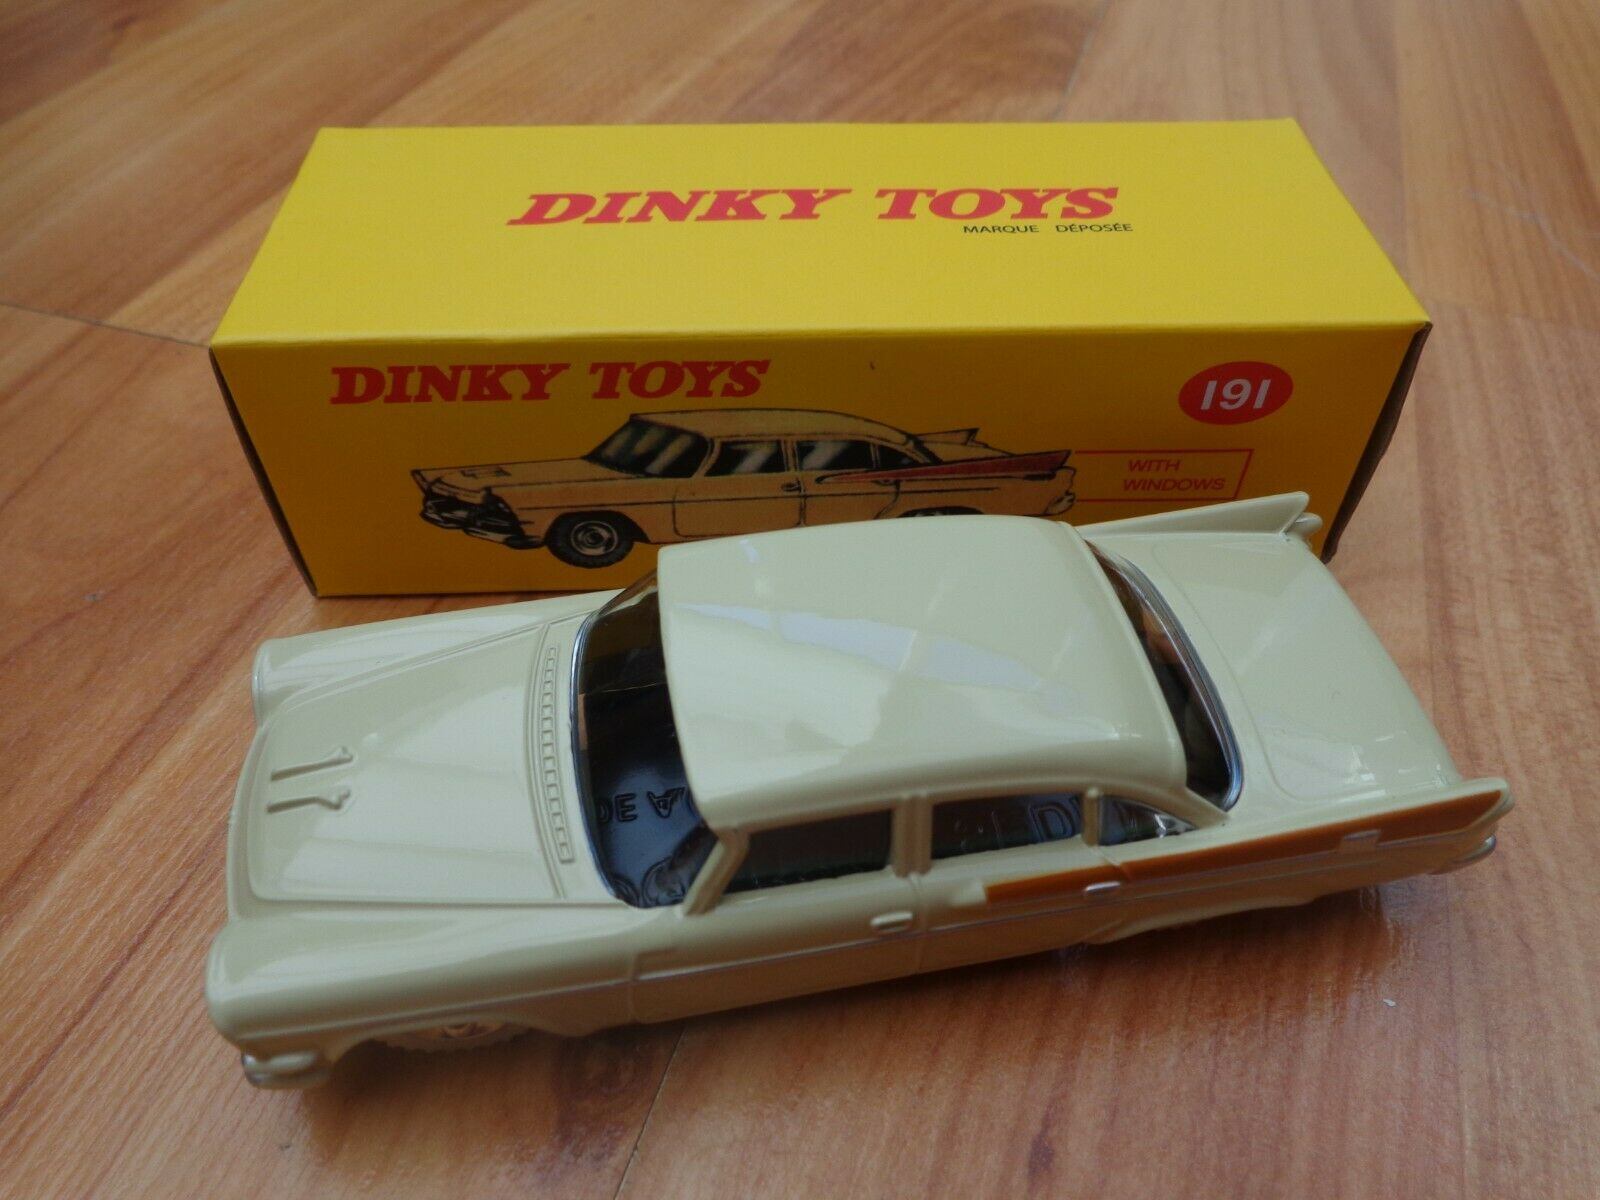 DINKY TOYS 191 DODGE ROYAL SEDAN CAR - NEW BOXED - ATLAS EDITIONS